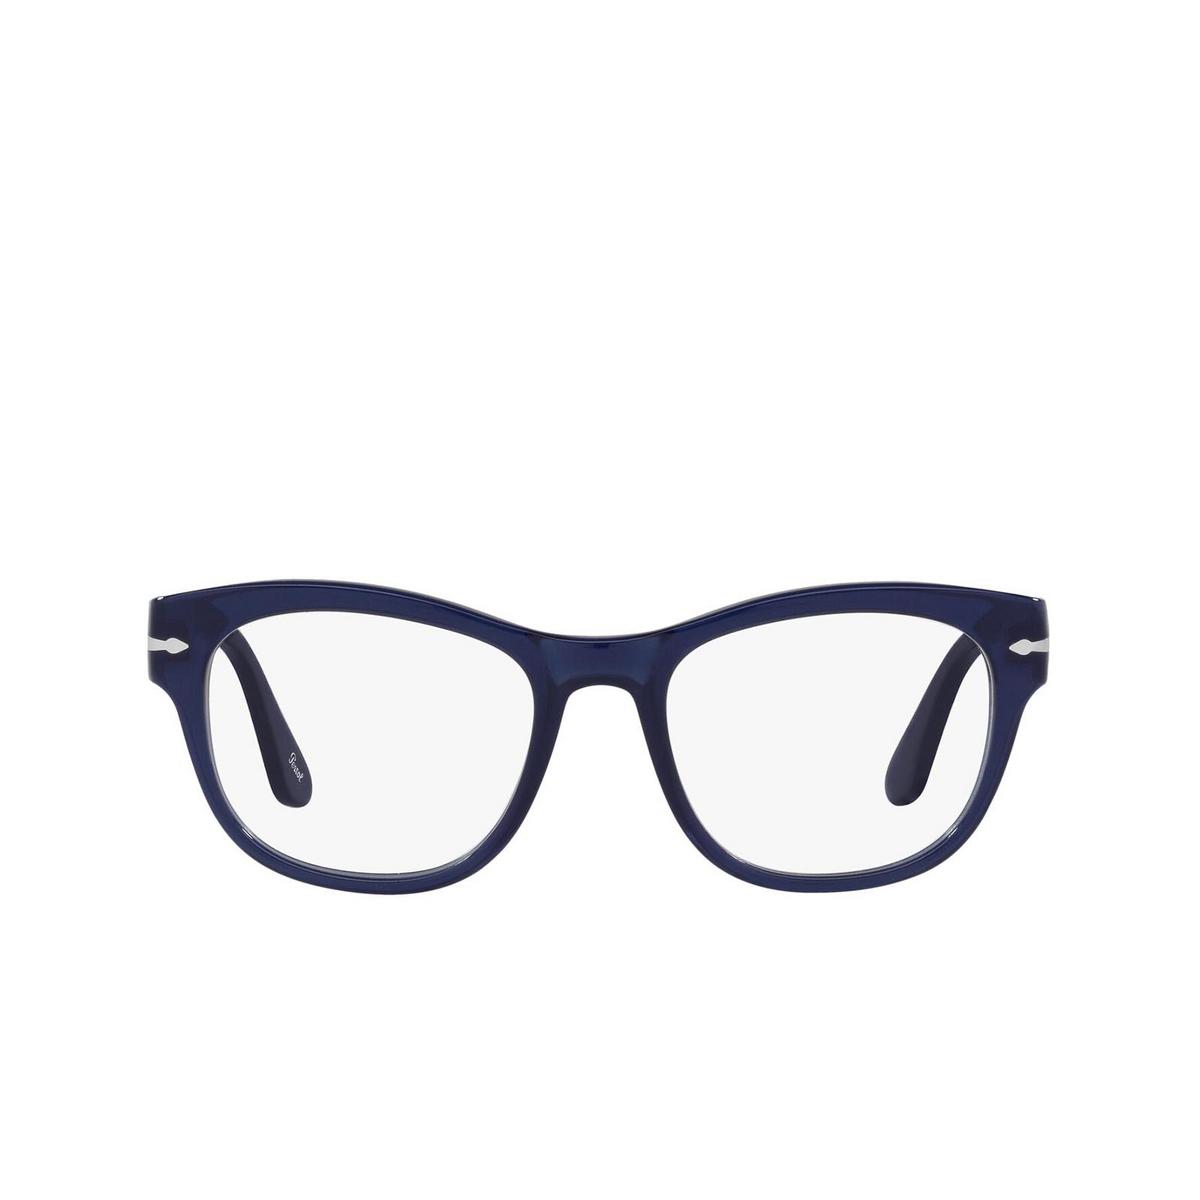 Persol® Square Eyeglasses: PO3270V color Cobalto 181 - front view.